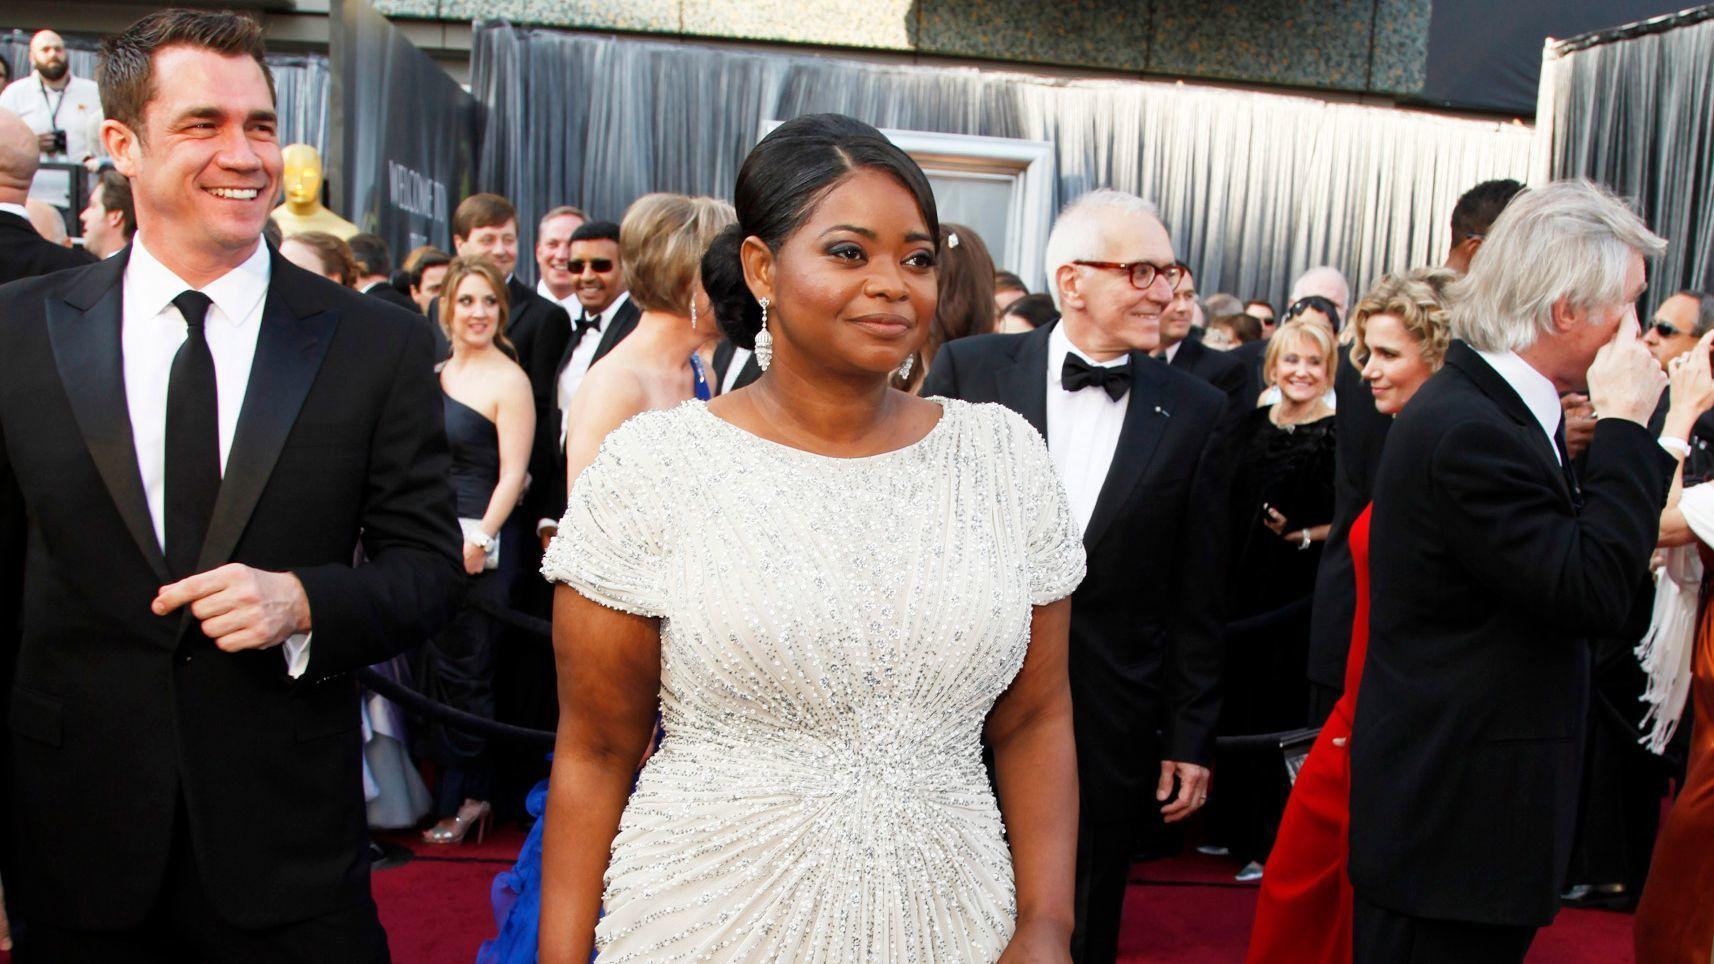 Oscar Winner Octavia Spencer Wears A Tadashi Shoji Gown To The 84th Academy Awards In Los